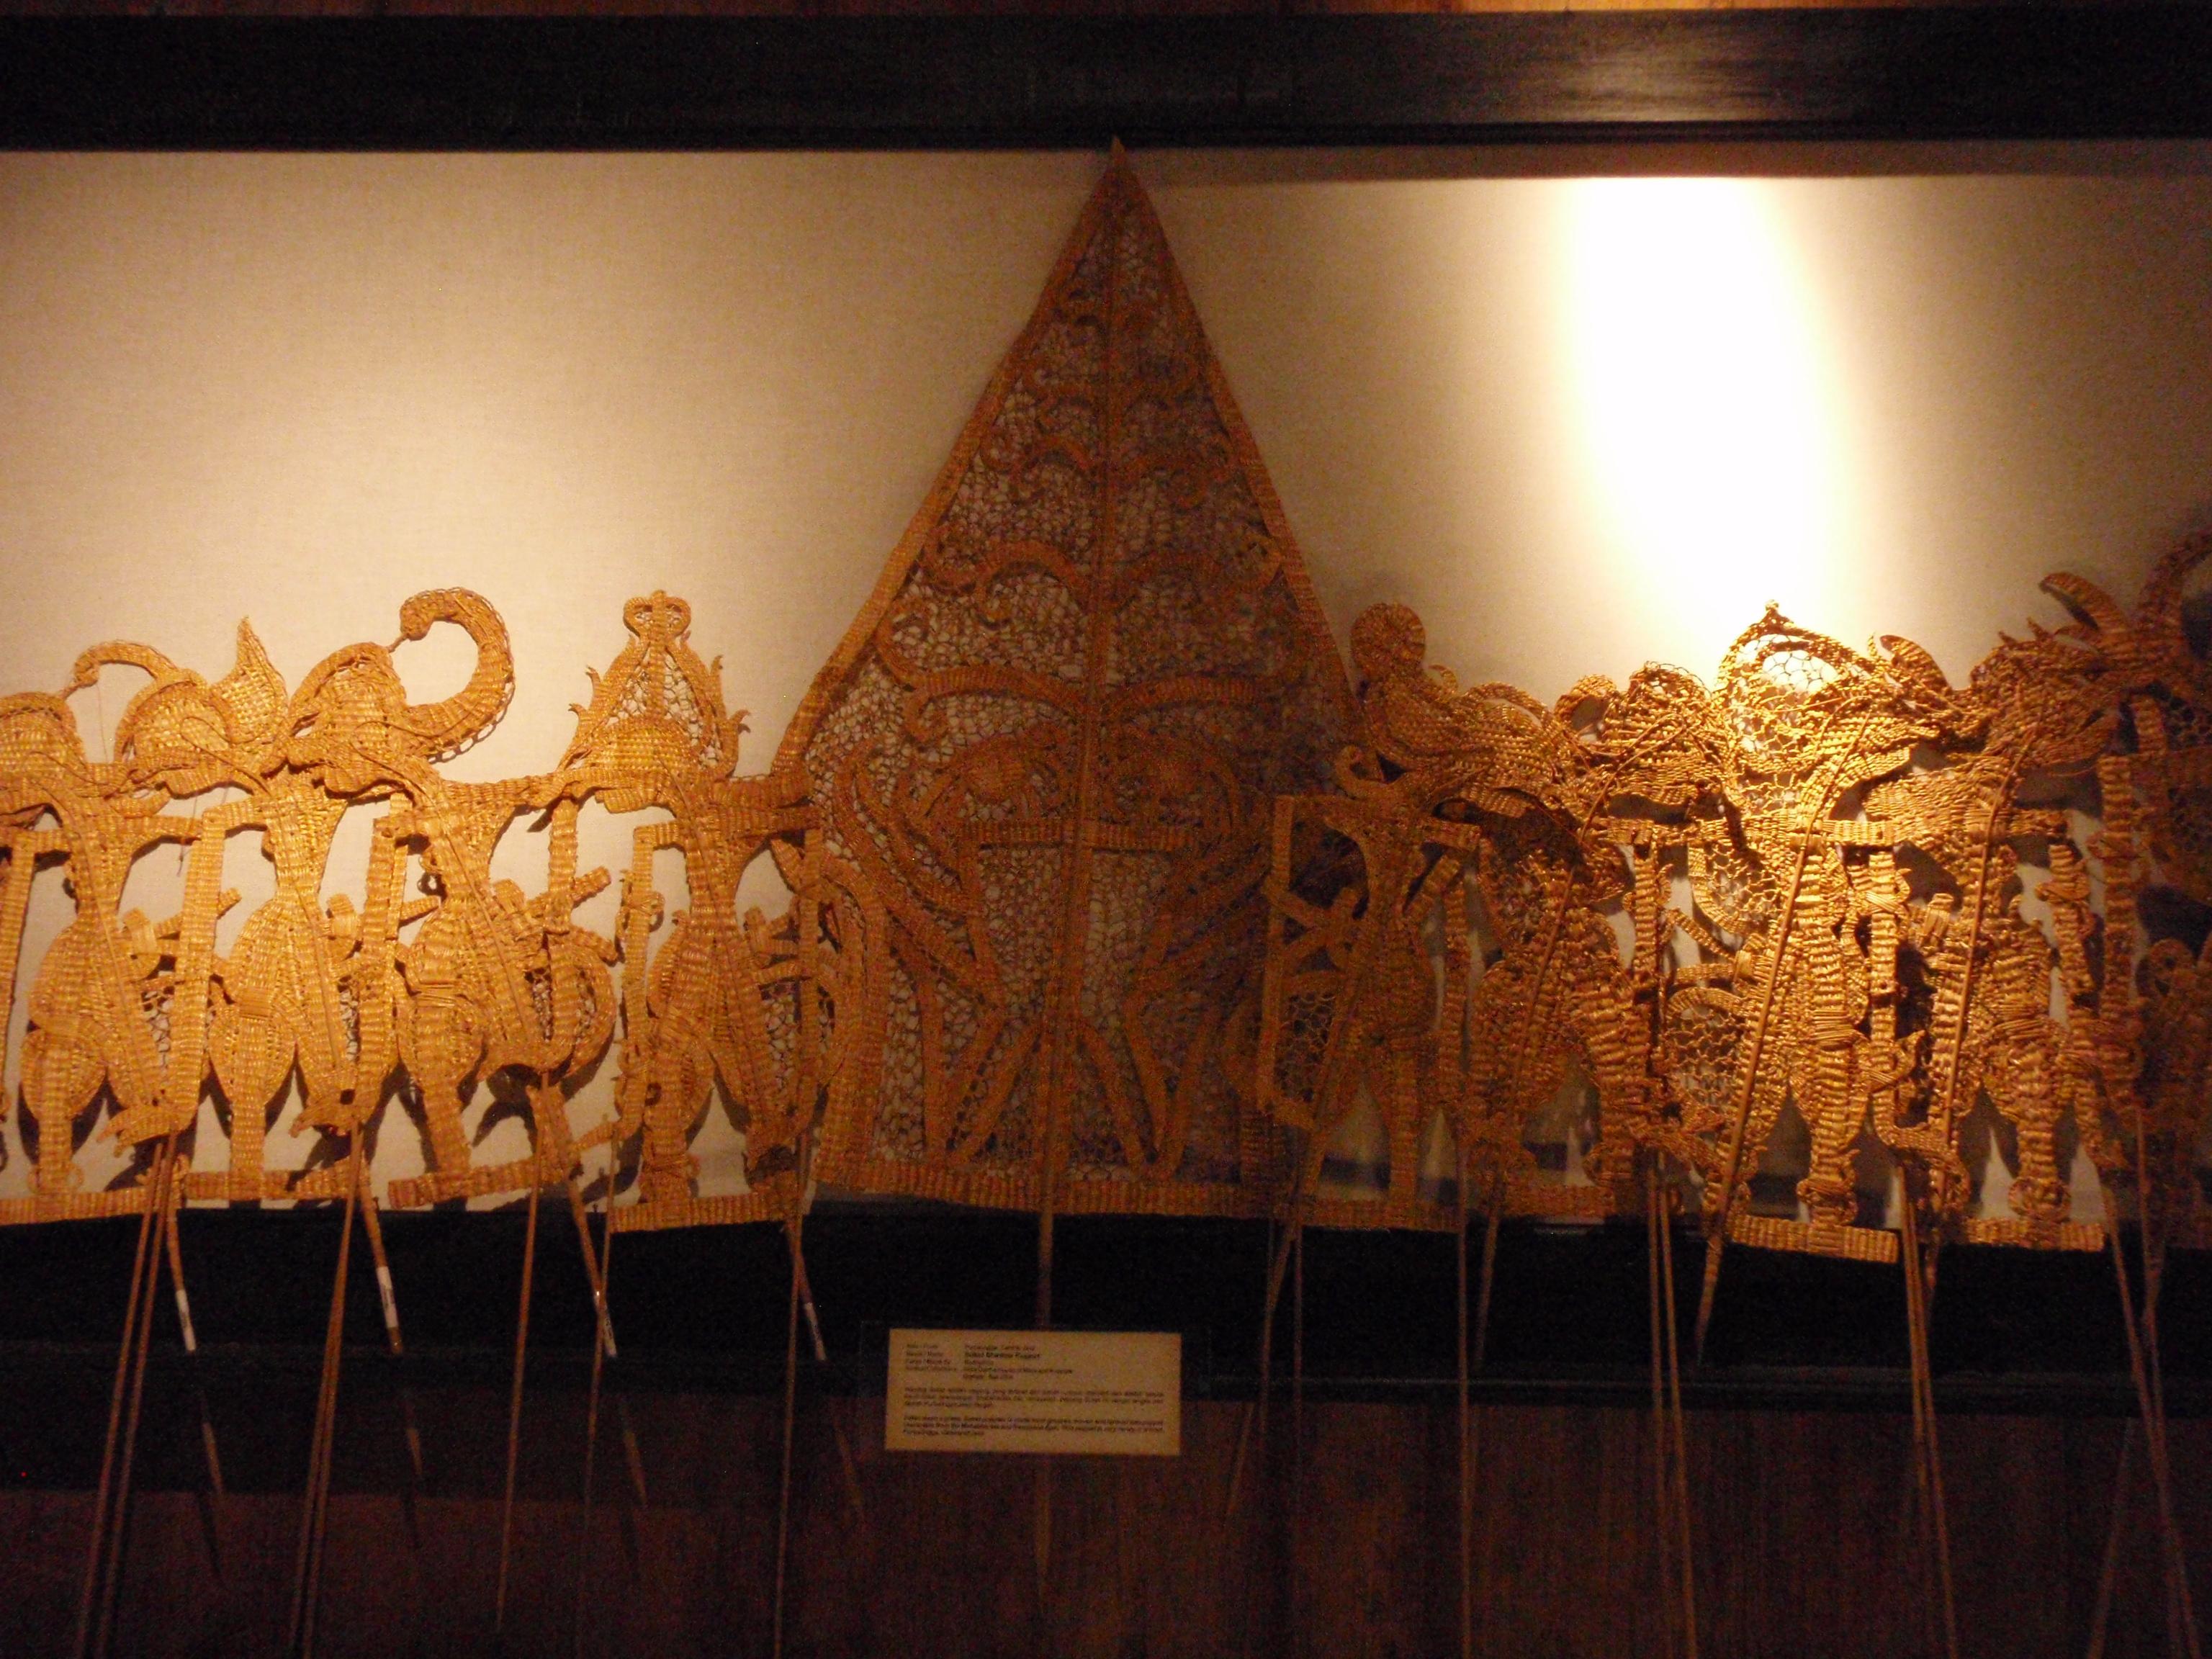 Wayang suket. Marionnettes faites en paille. Collection : Setia Darma House of Masks and Puppets, Gianyar, Bali, Indonésie.